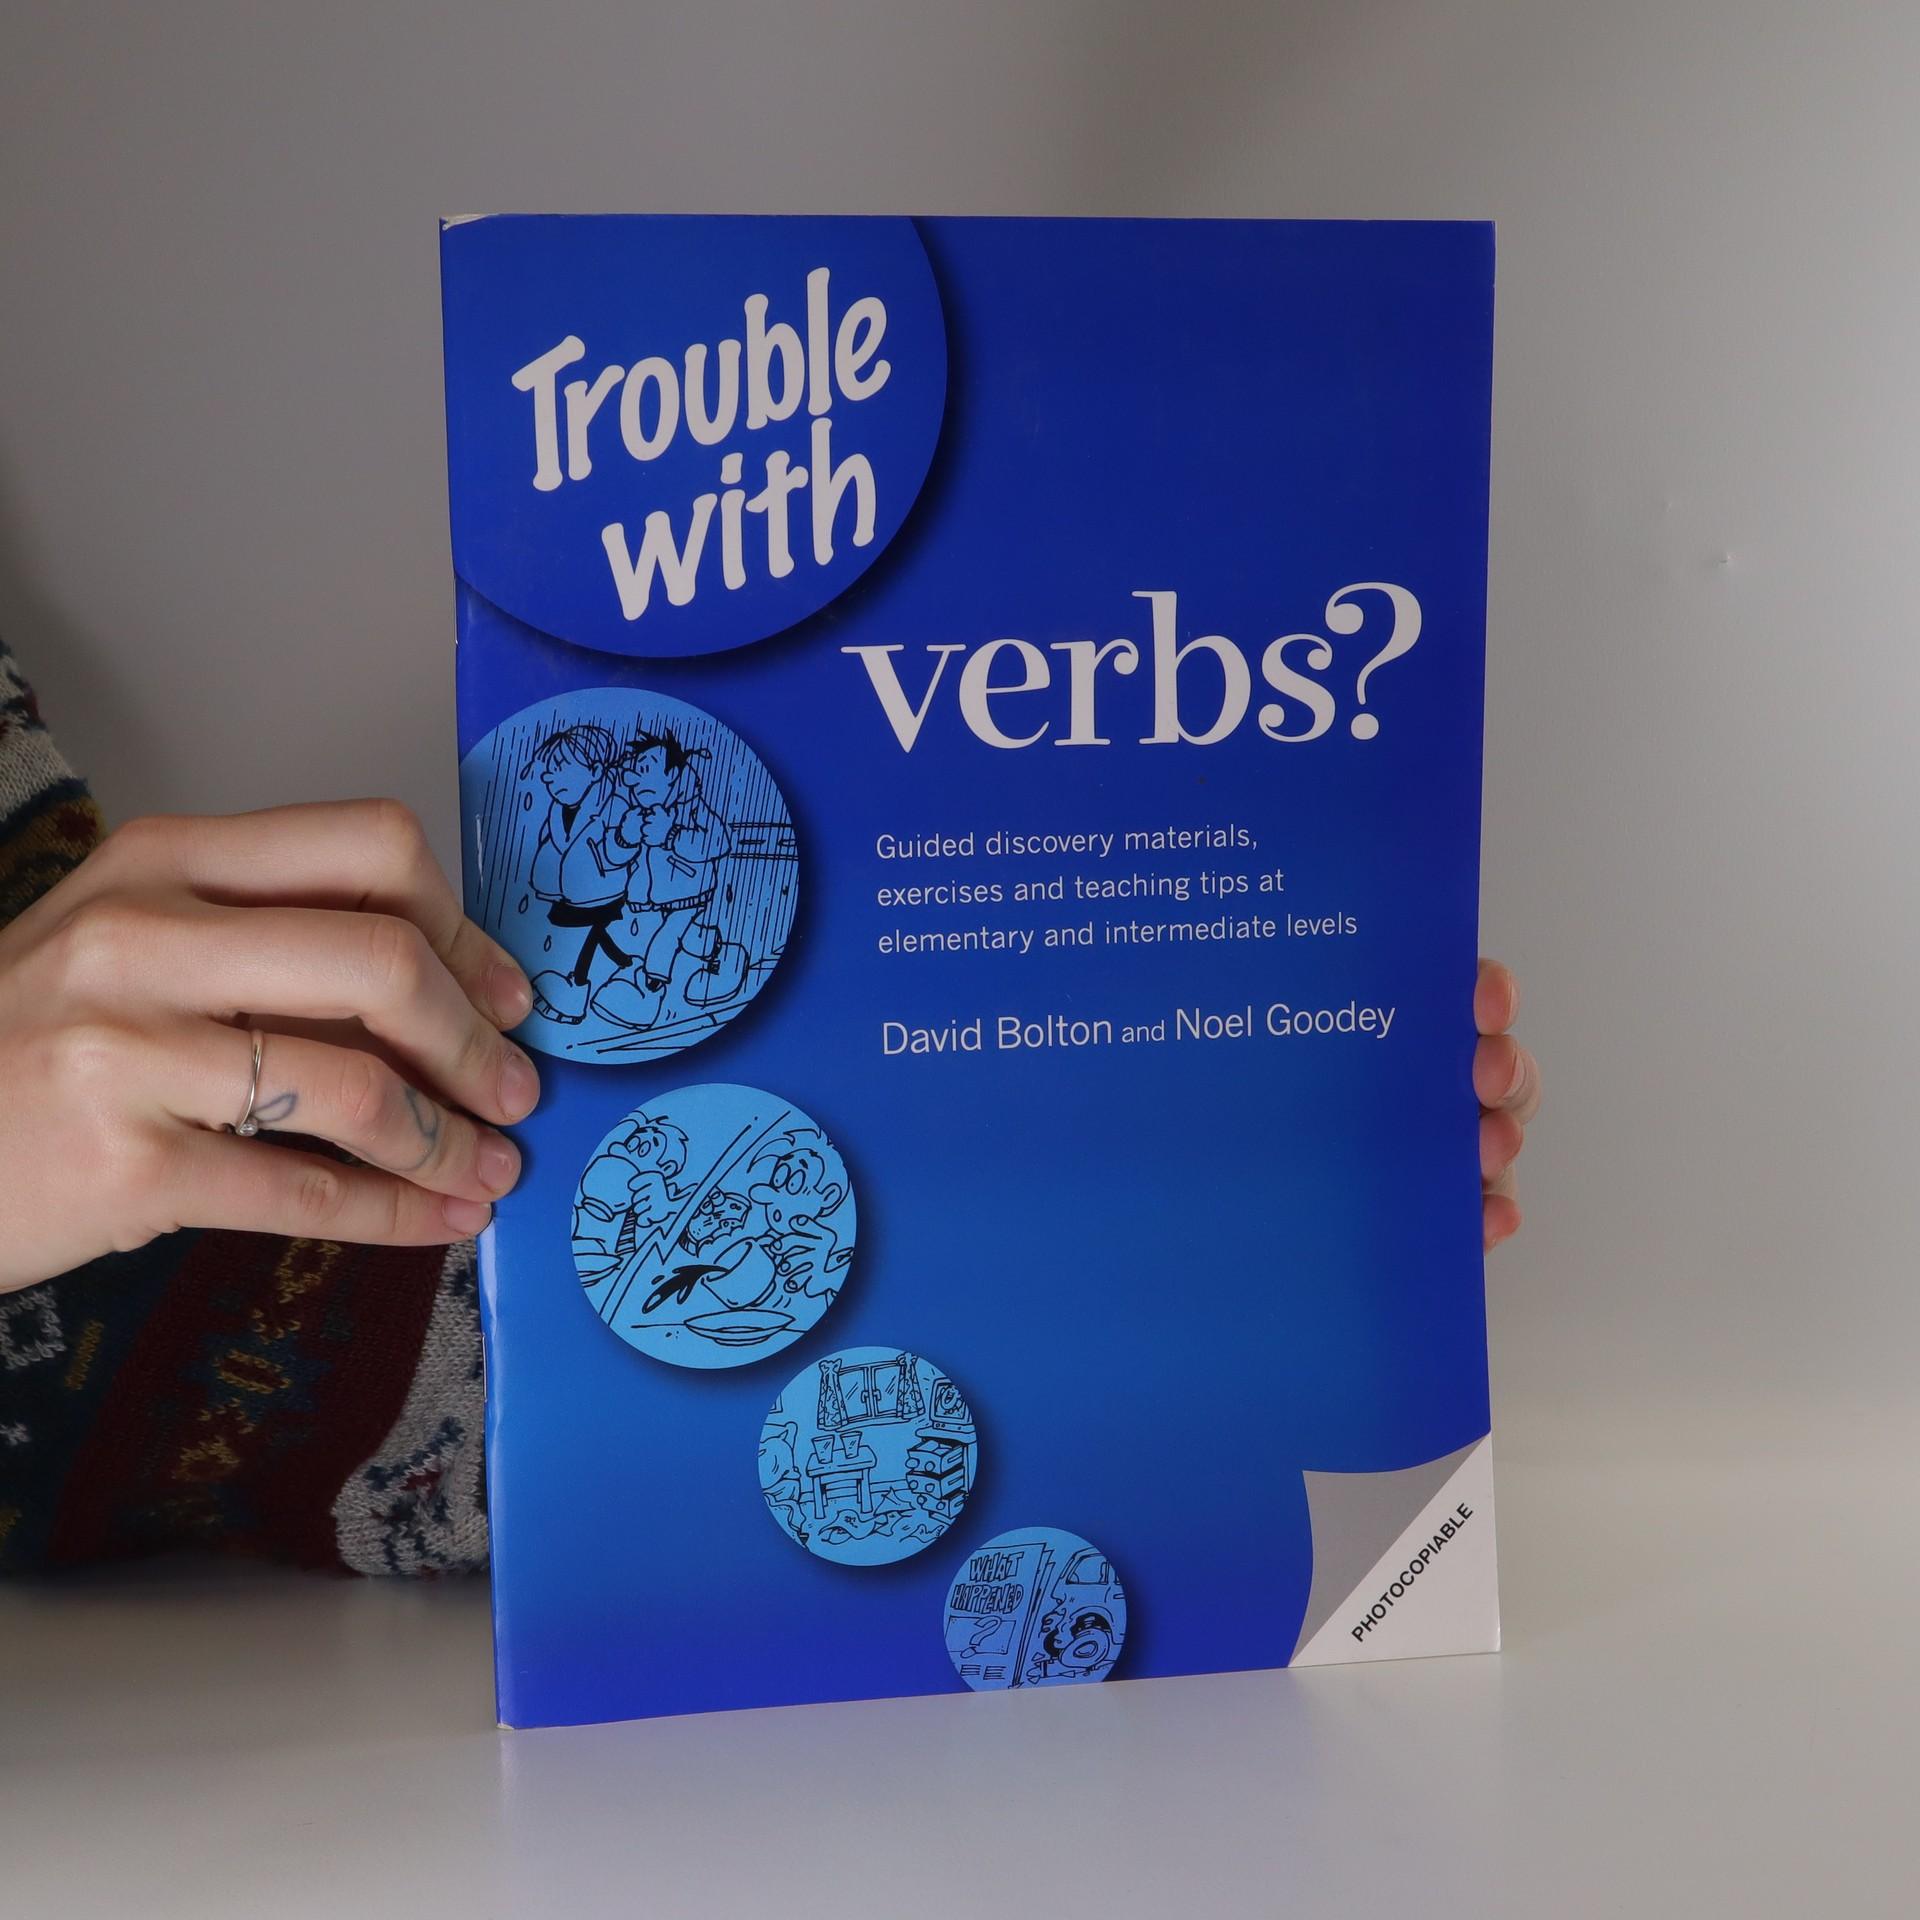 antikvární kniha Trouble with verbs?, 1999